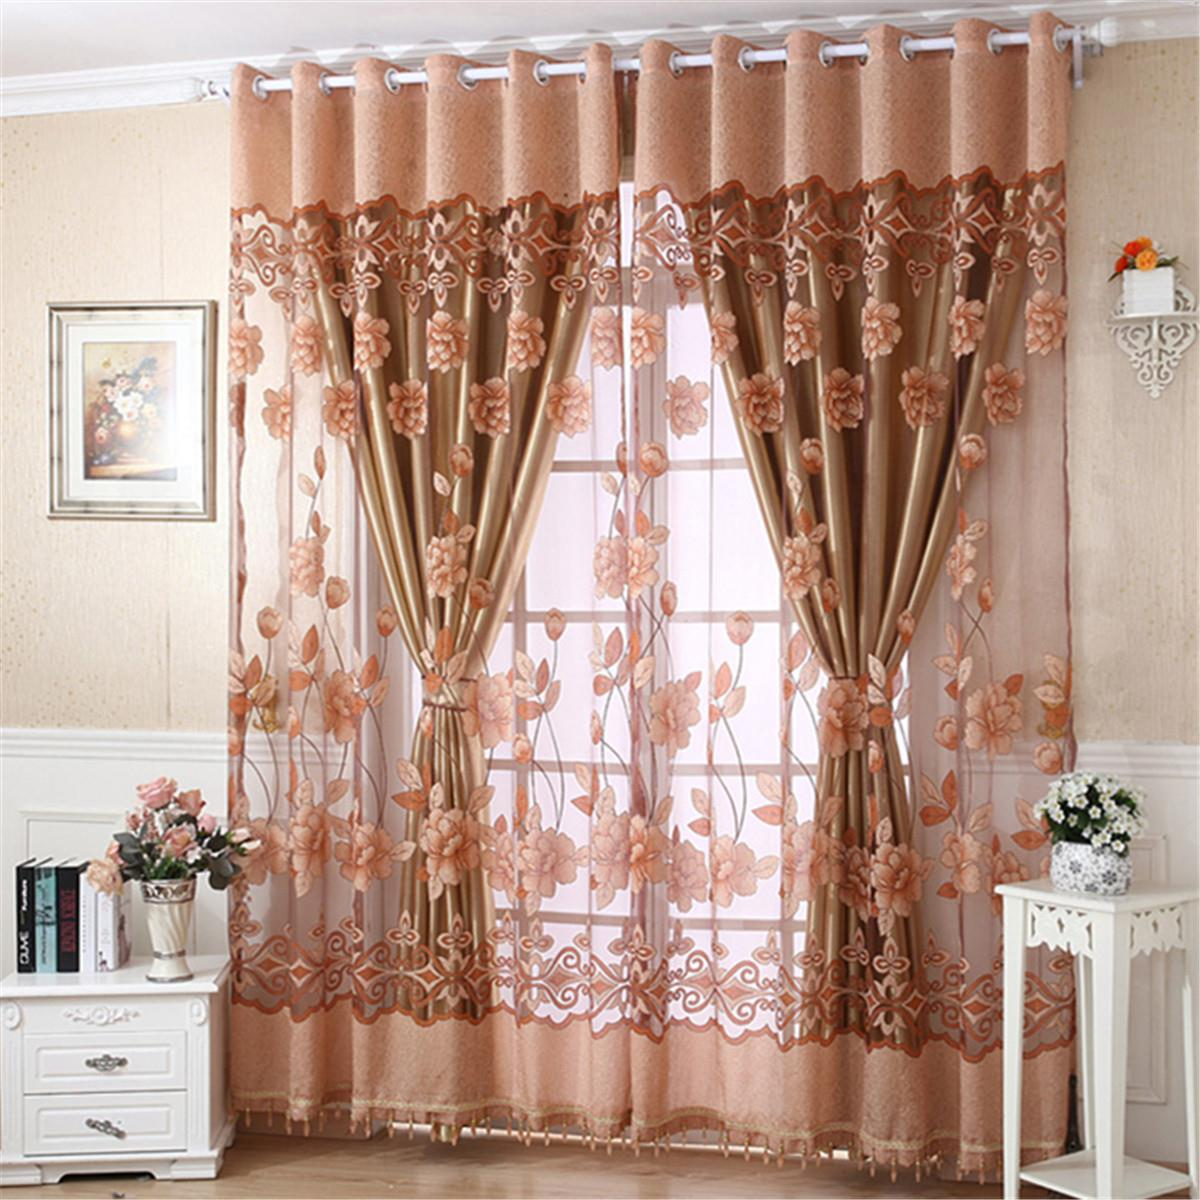 Bedroom valance curtains - Elegant Flower Print Tulle Door Drape Window Curtain Home Panel Sheer Scarf Valances Living Room Bedroom